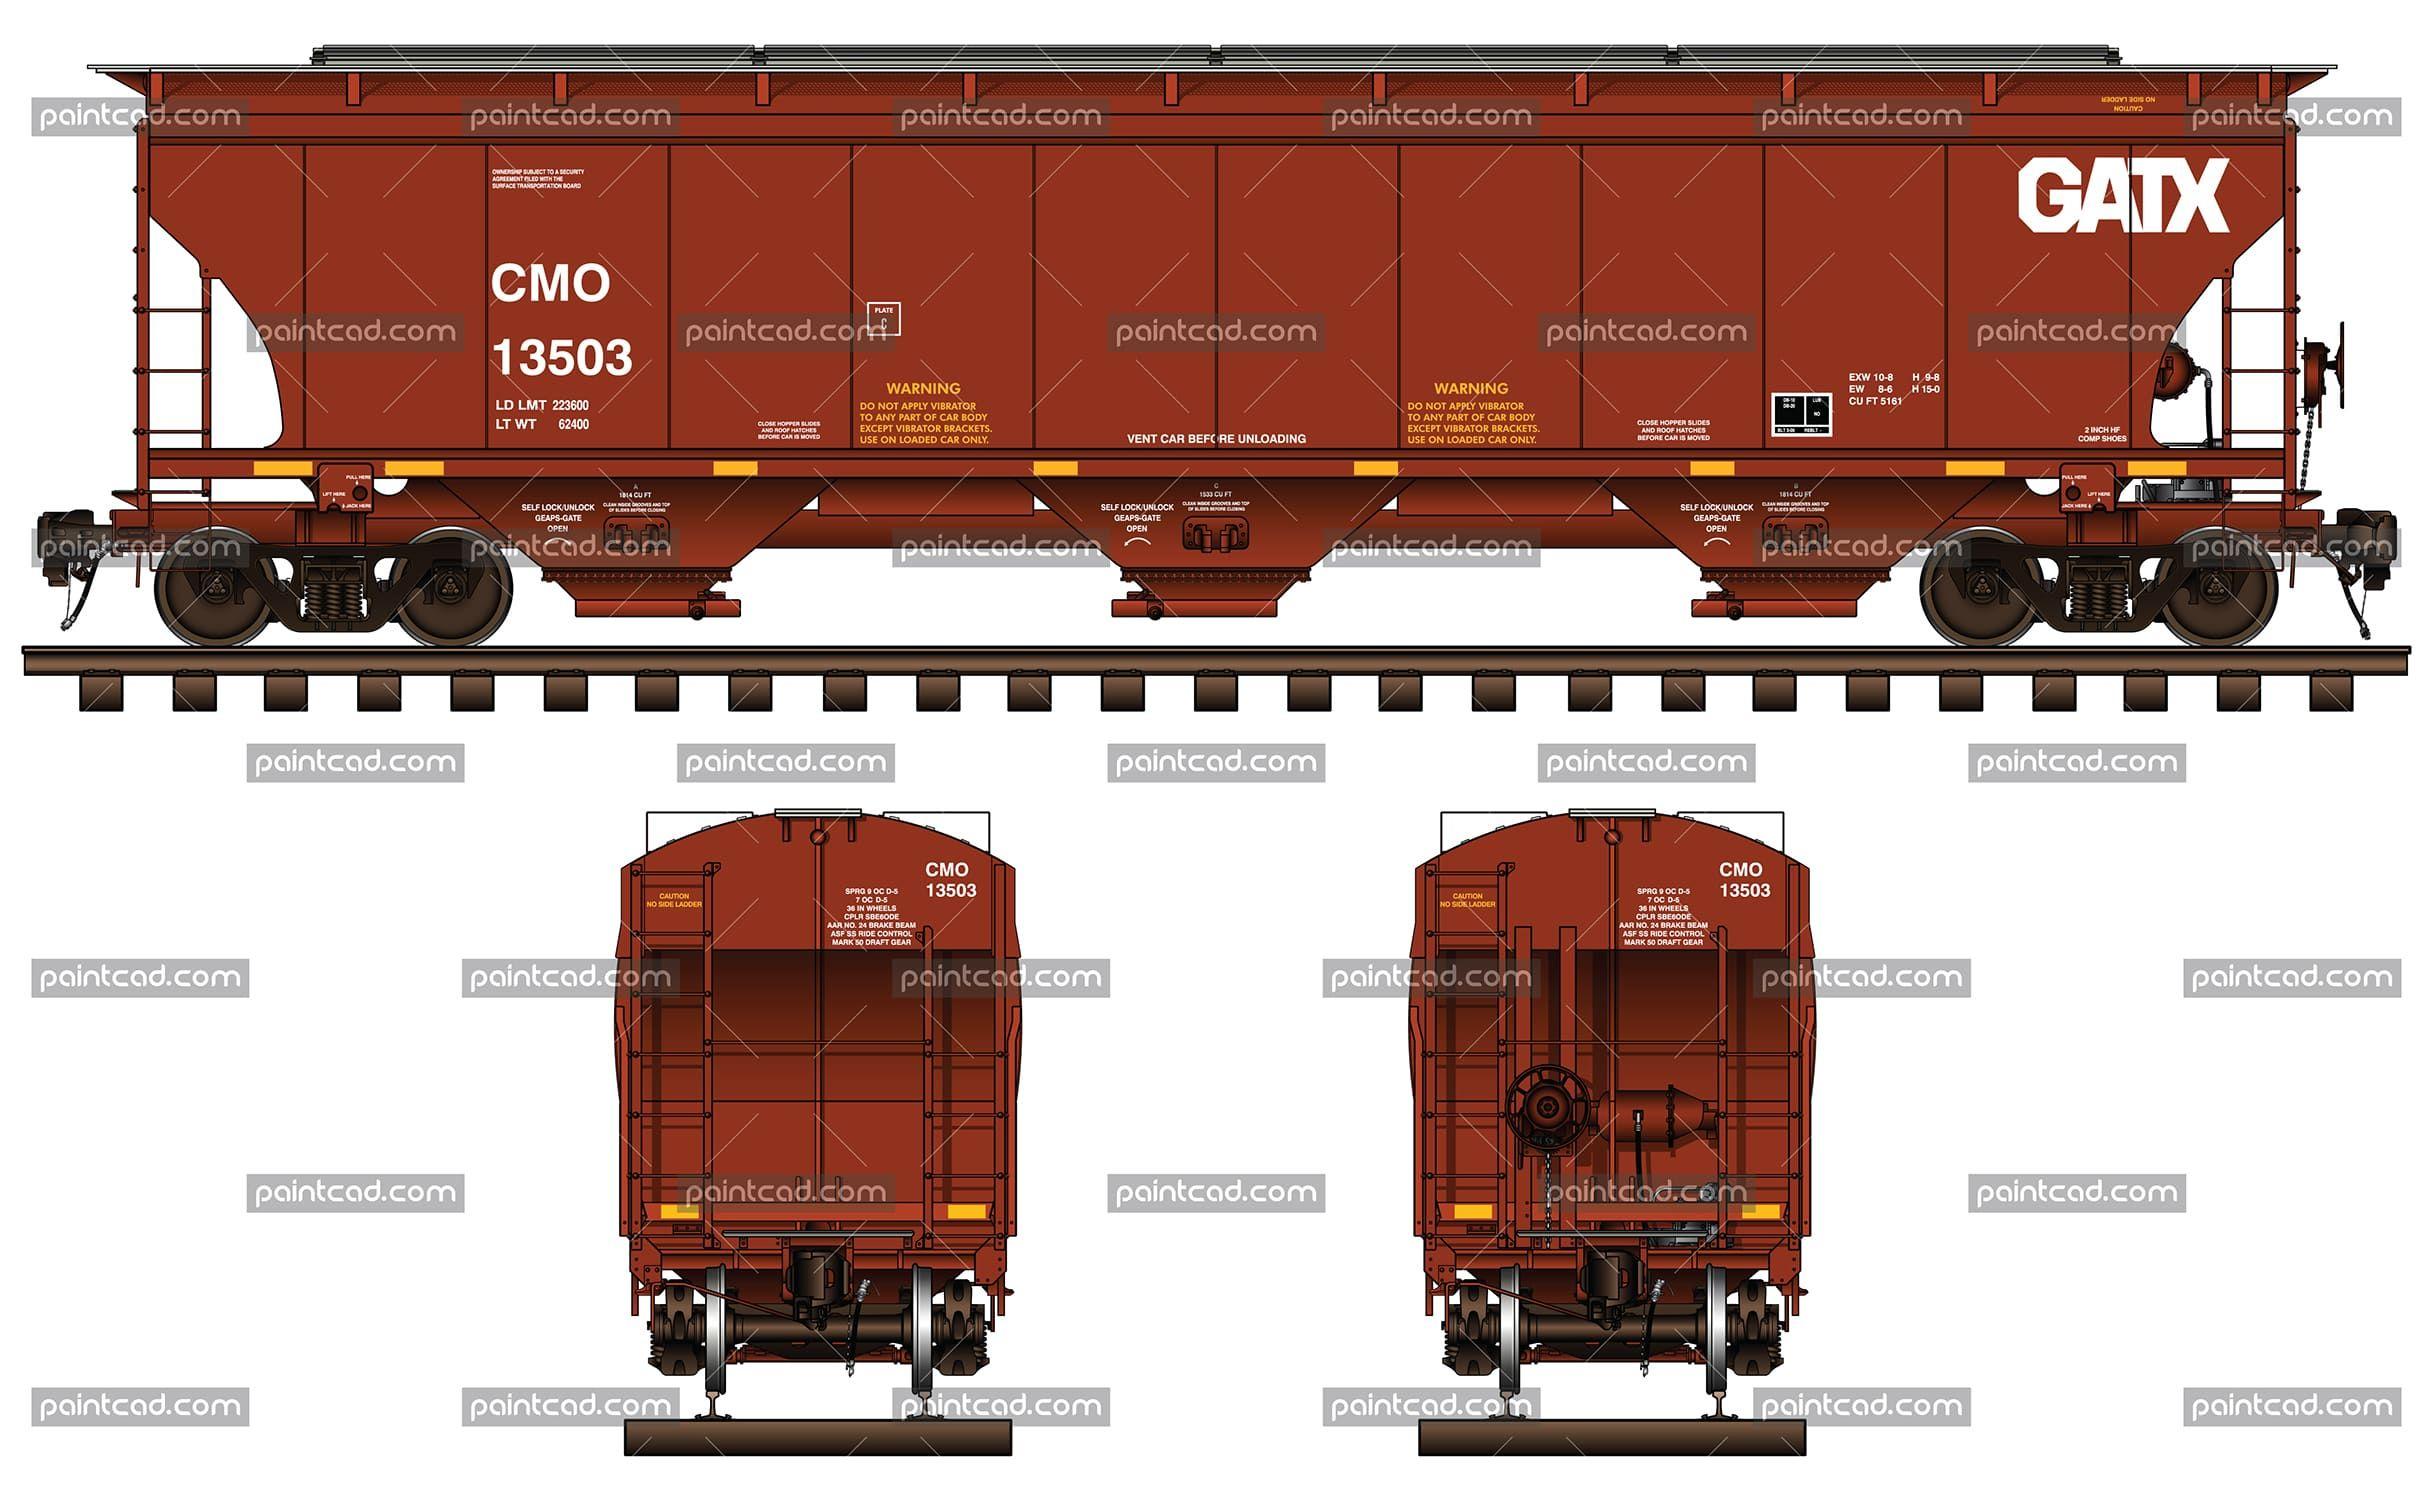 3 Bay Covered Hopper Car In Red Livery Of Cmo Gatx Railway Railway Train Drawing Model Railroad